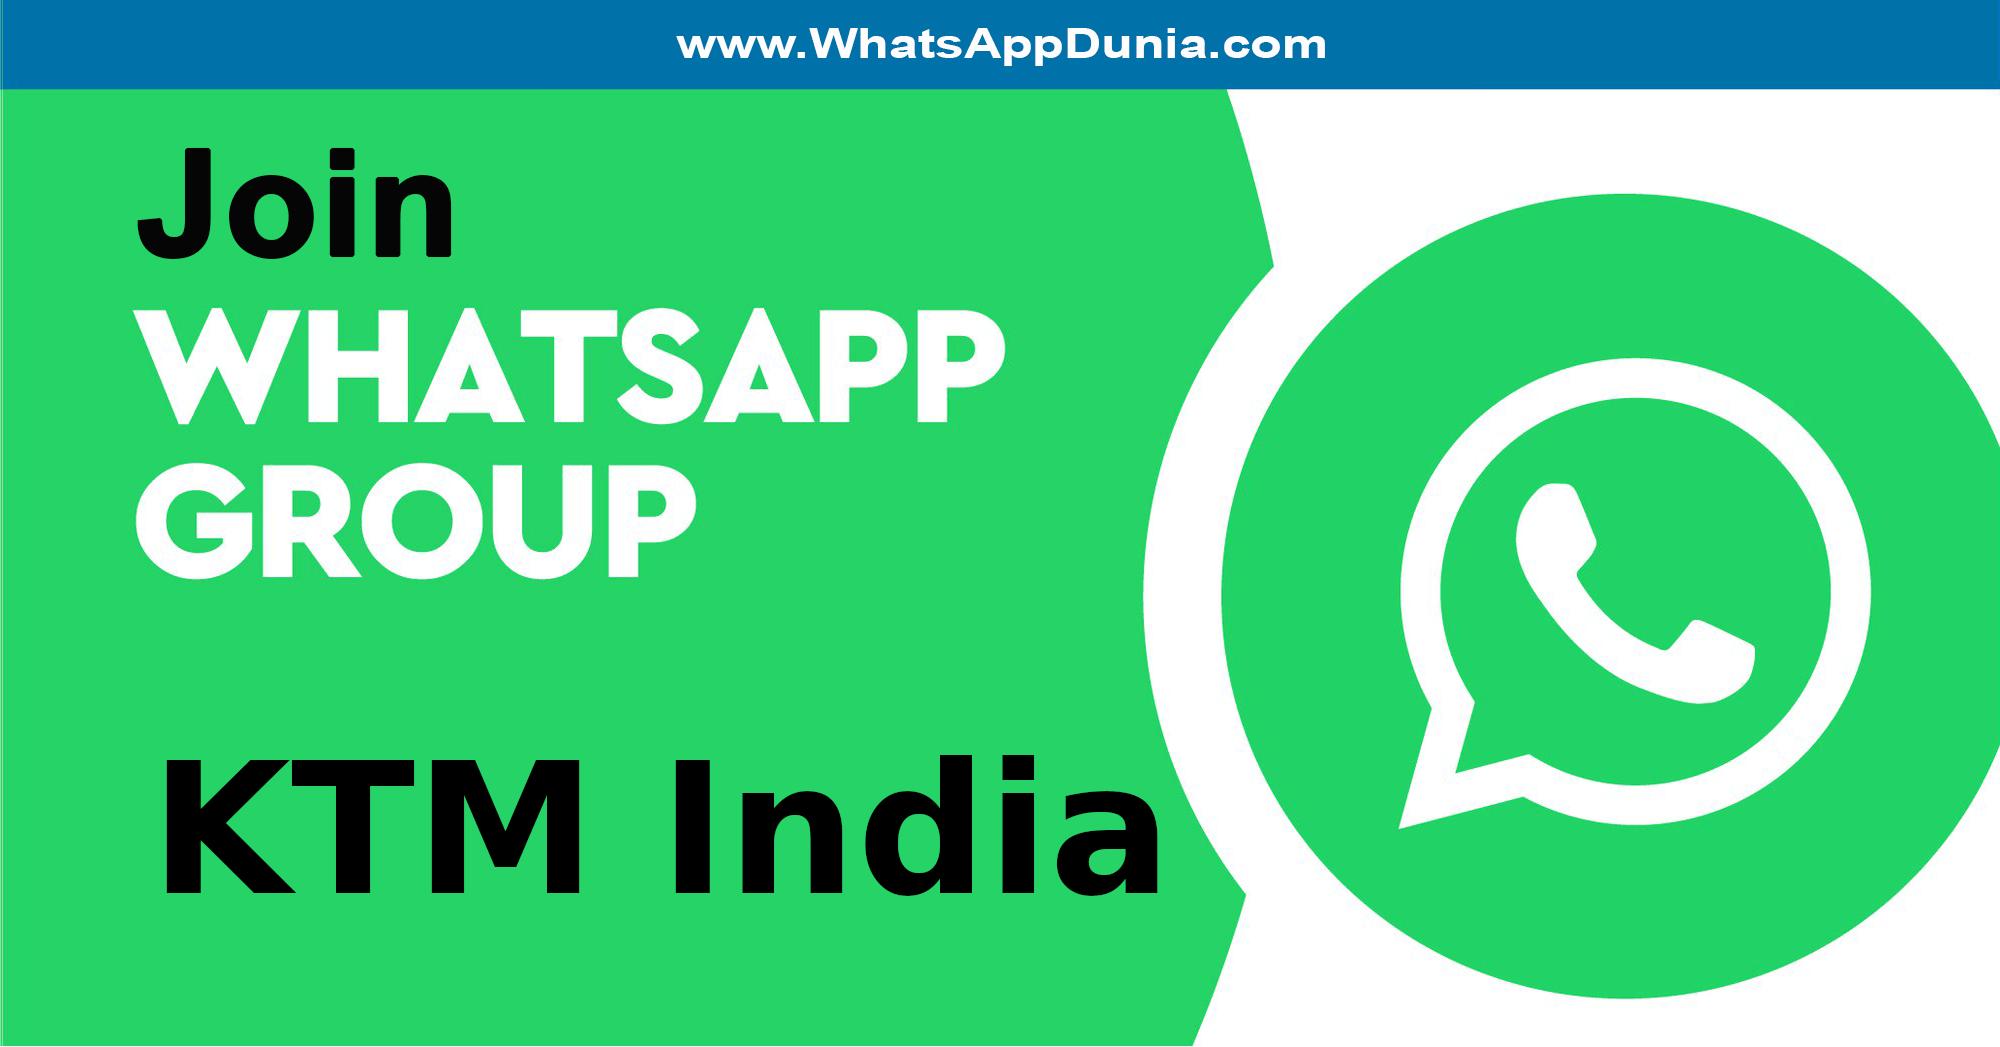 KTM India WhatsApp Group Links